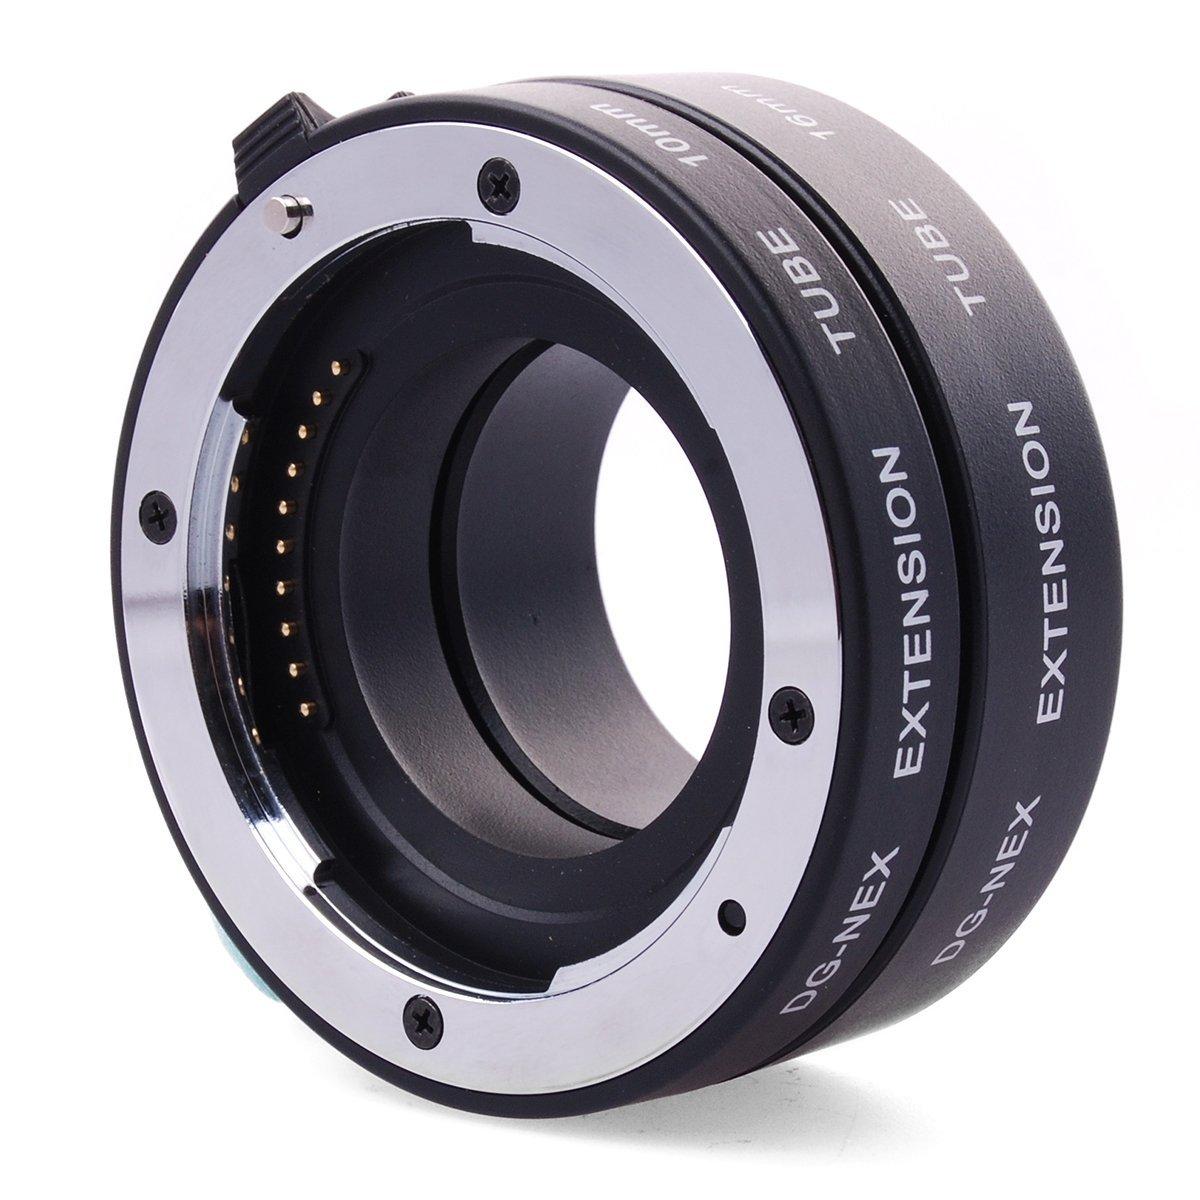 DG-NEX металлическая автоматическая фокусировка AF макро е Автофокус металлическая удлинитель для Sony E-Mount A6500 A6400 A6300 A6000 a7 a9 a7r a7m3